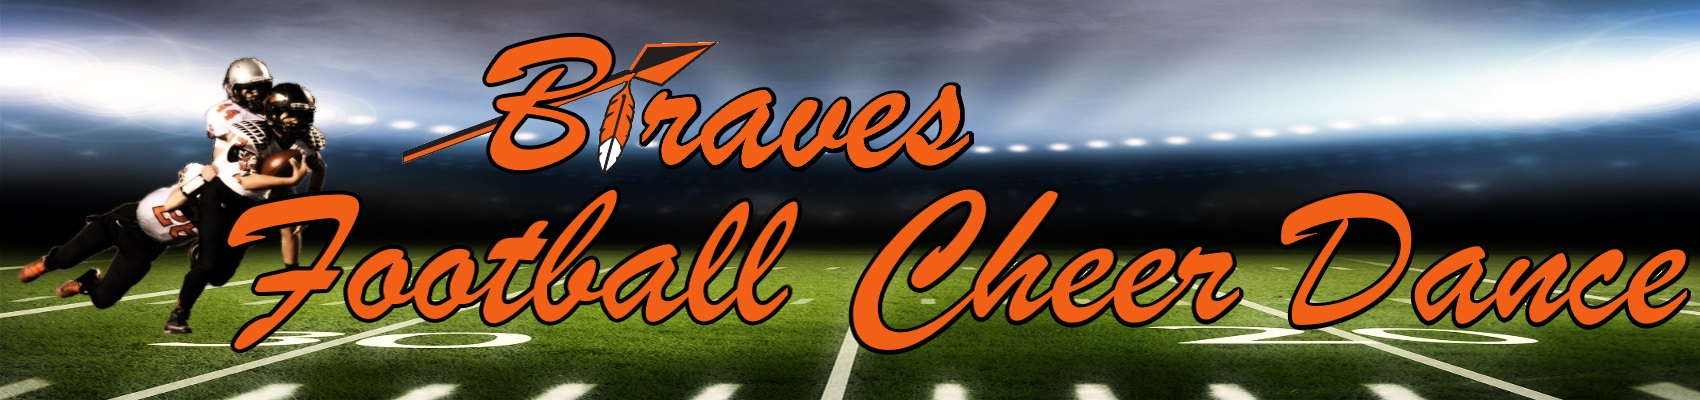 Chanooka Braves, Multi-Sport, Goal, Field